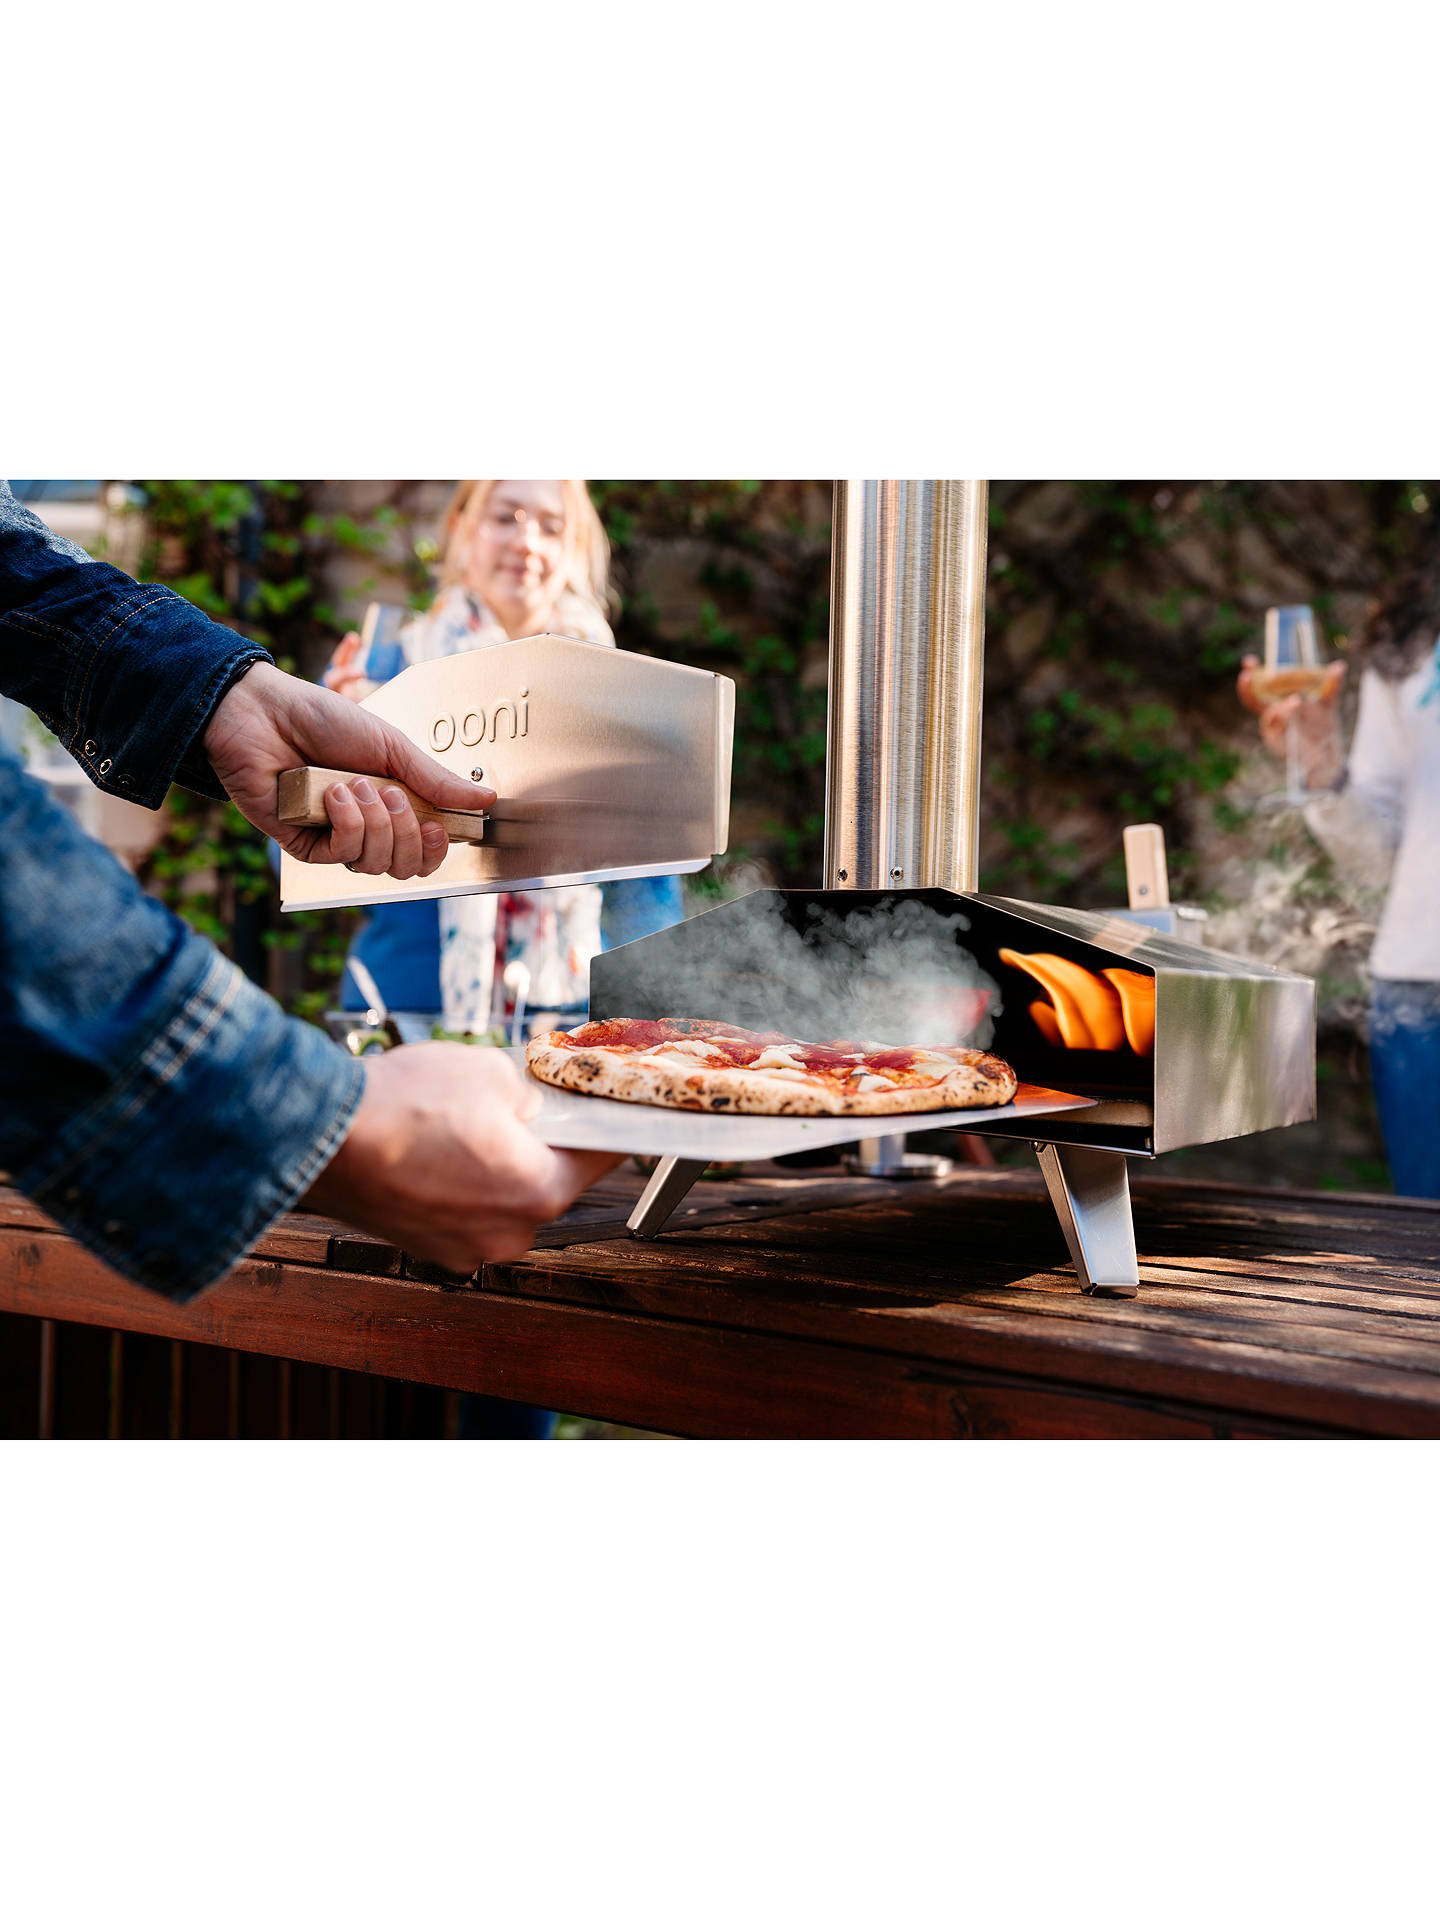 Ooni 3 Outdoor Pizza Oven